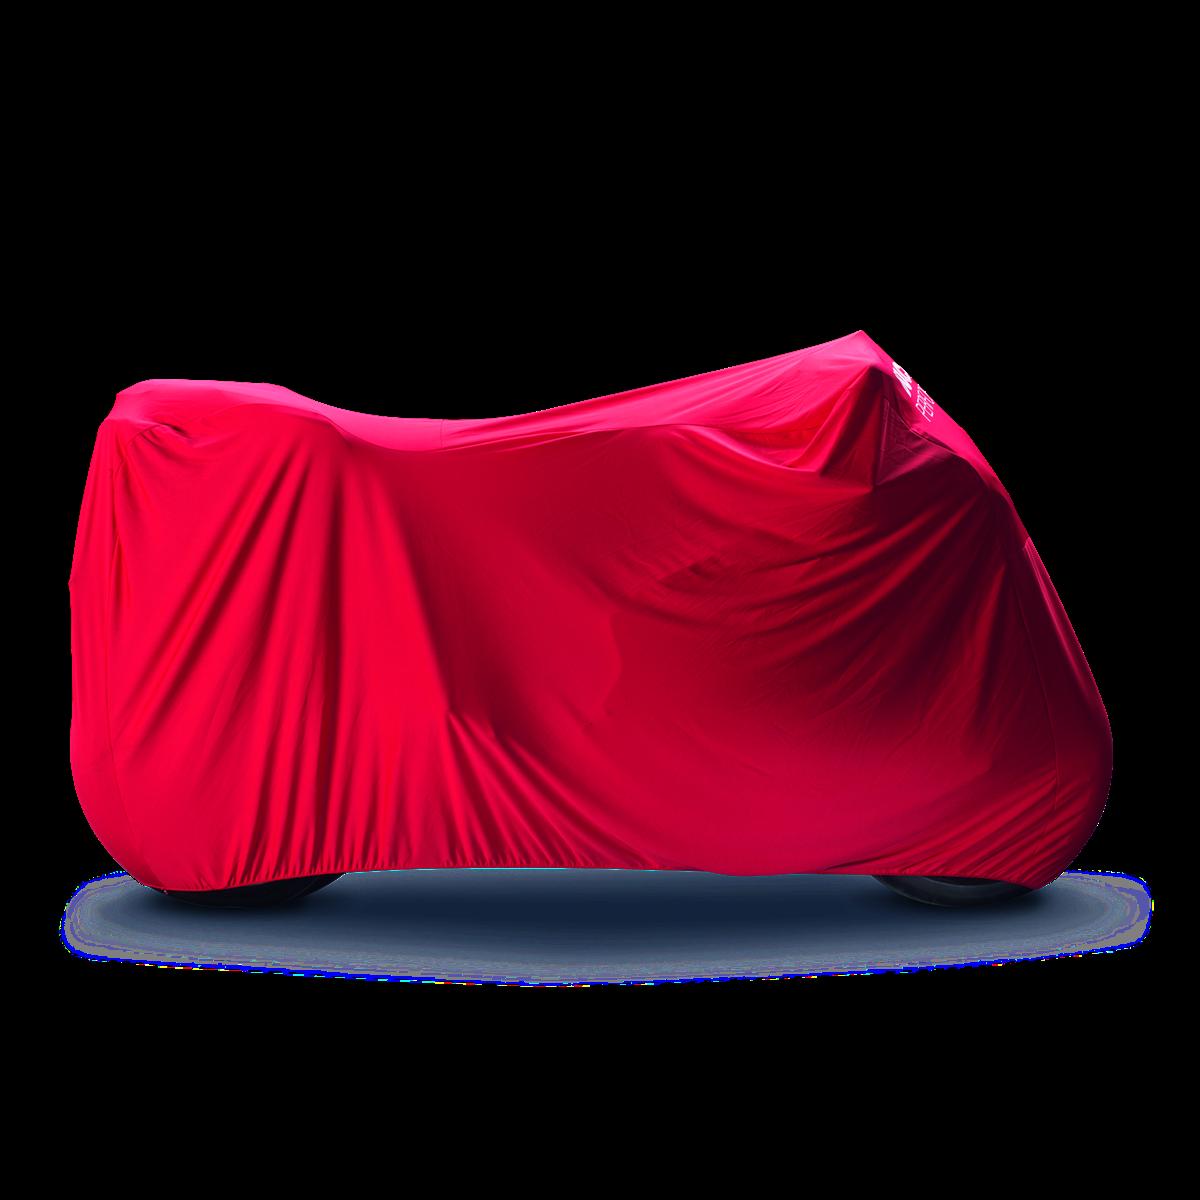 ducati housse int rieur rouge s team motos. Black Bedroom Furniture Sets. Home Design Ideas